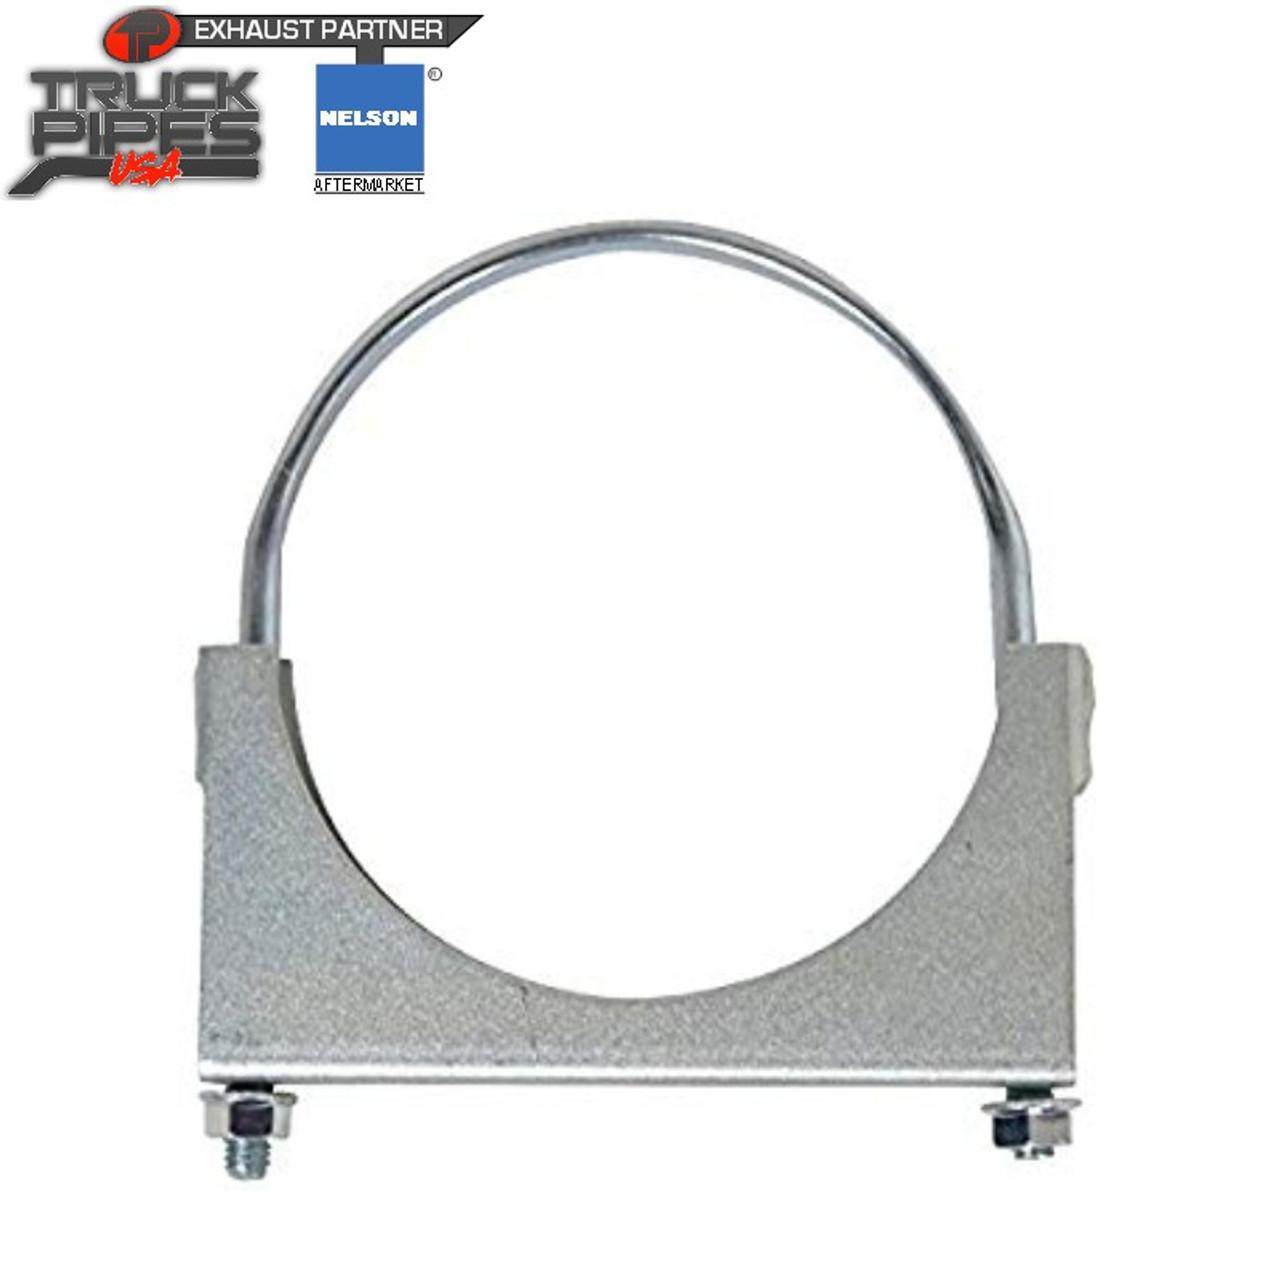 "3.5"" Zinc Plated Heavy Duty U-Bolt Flat Band Clamp Bulk Qty 50  Nelson 89557B"